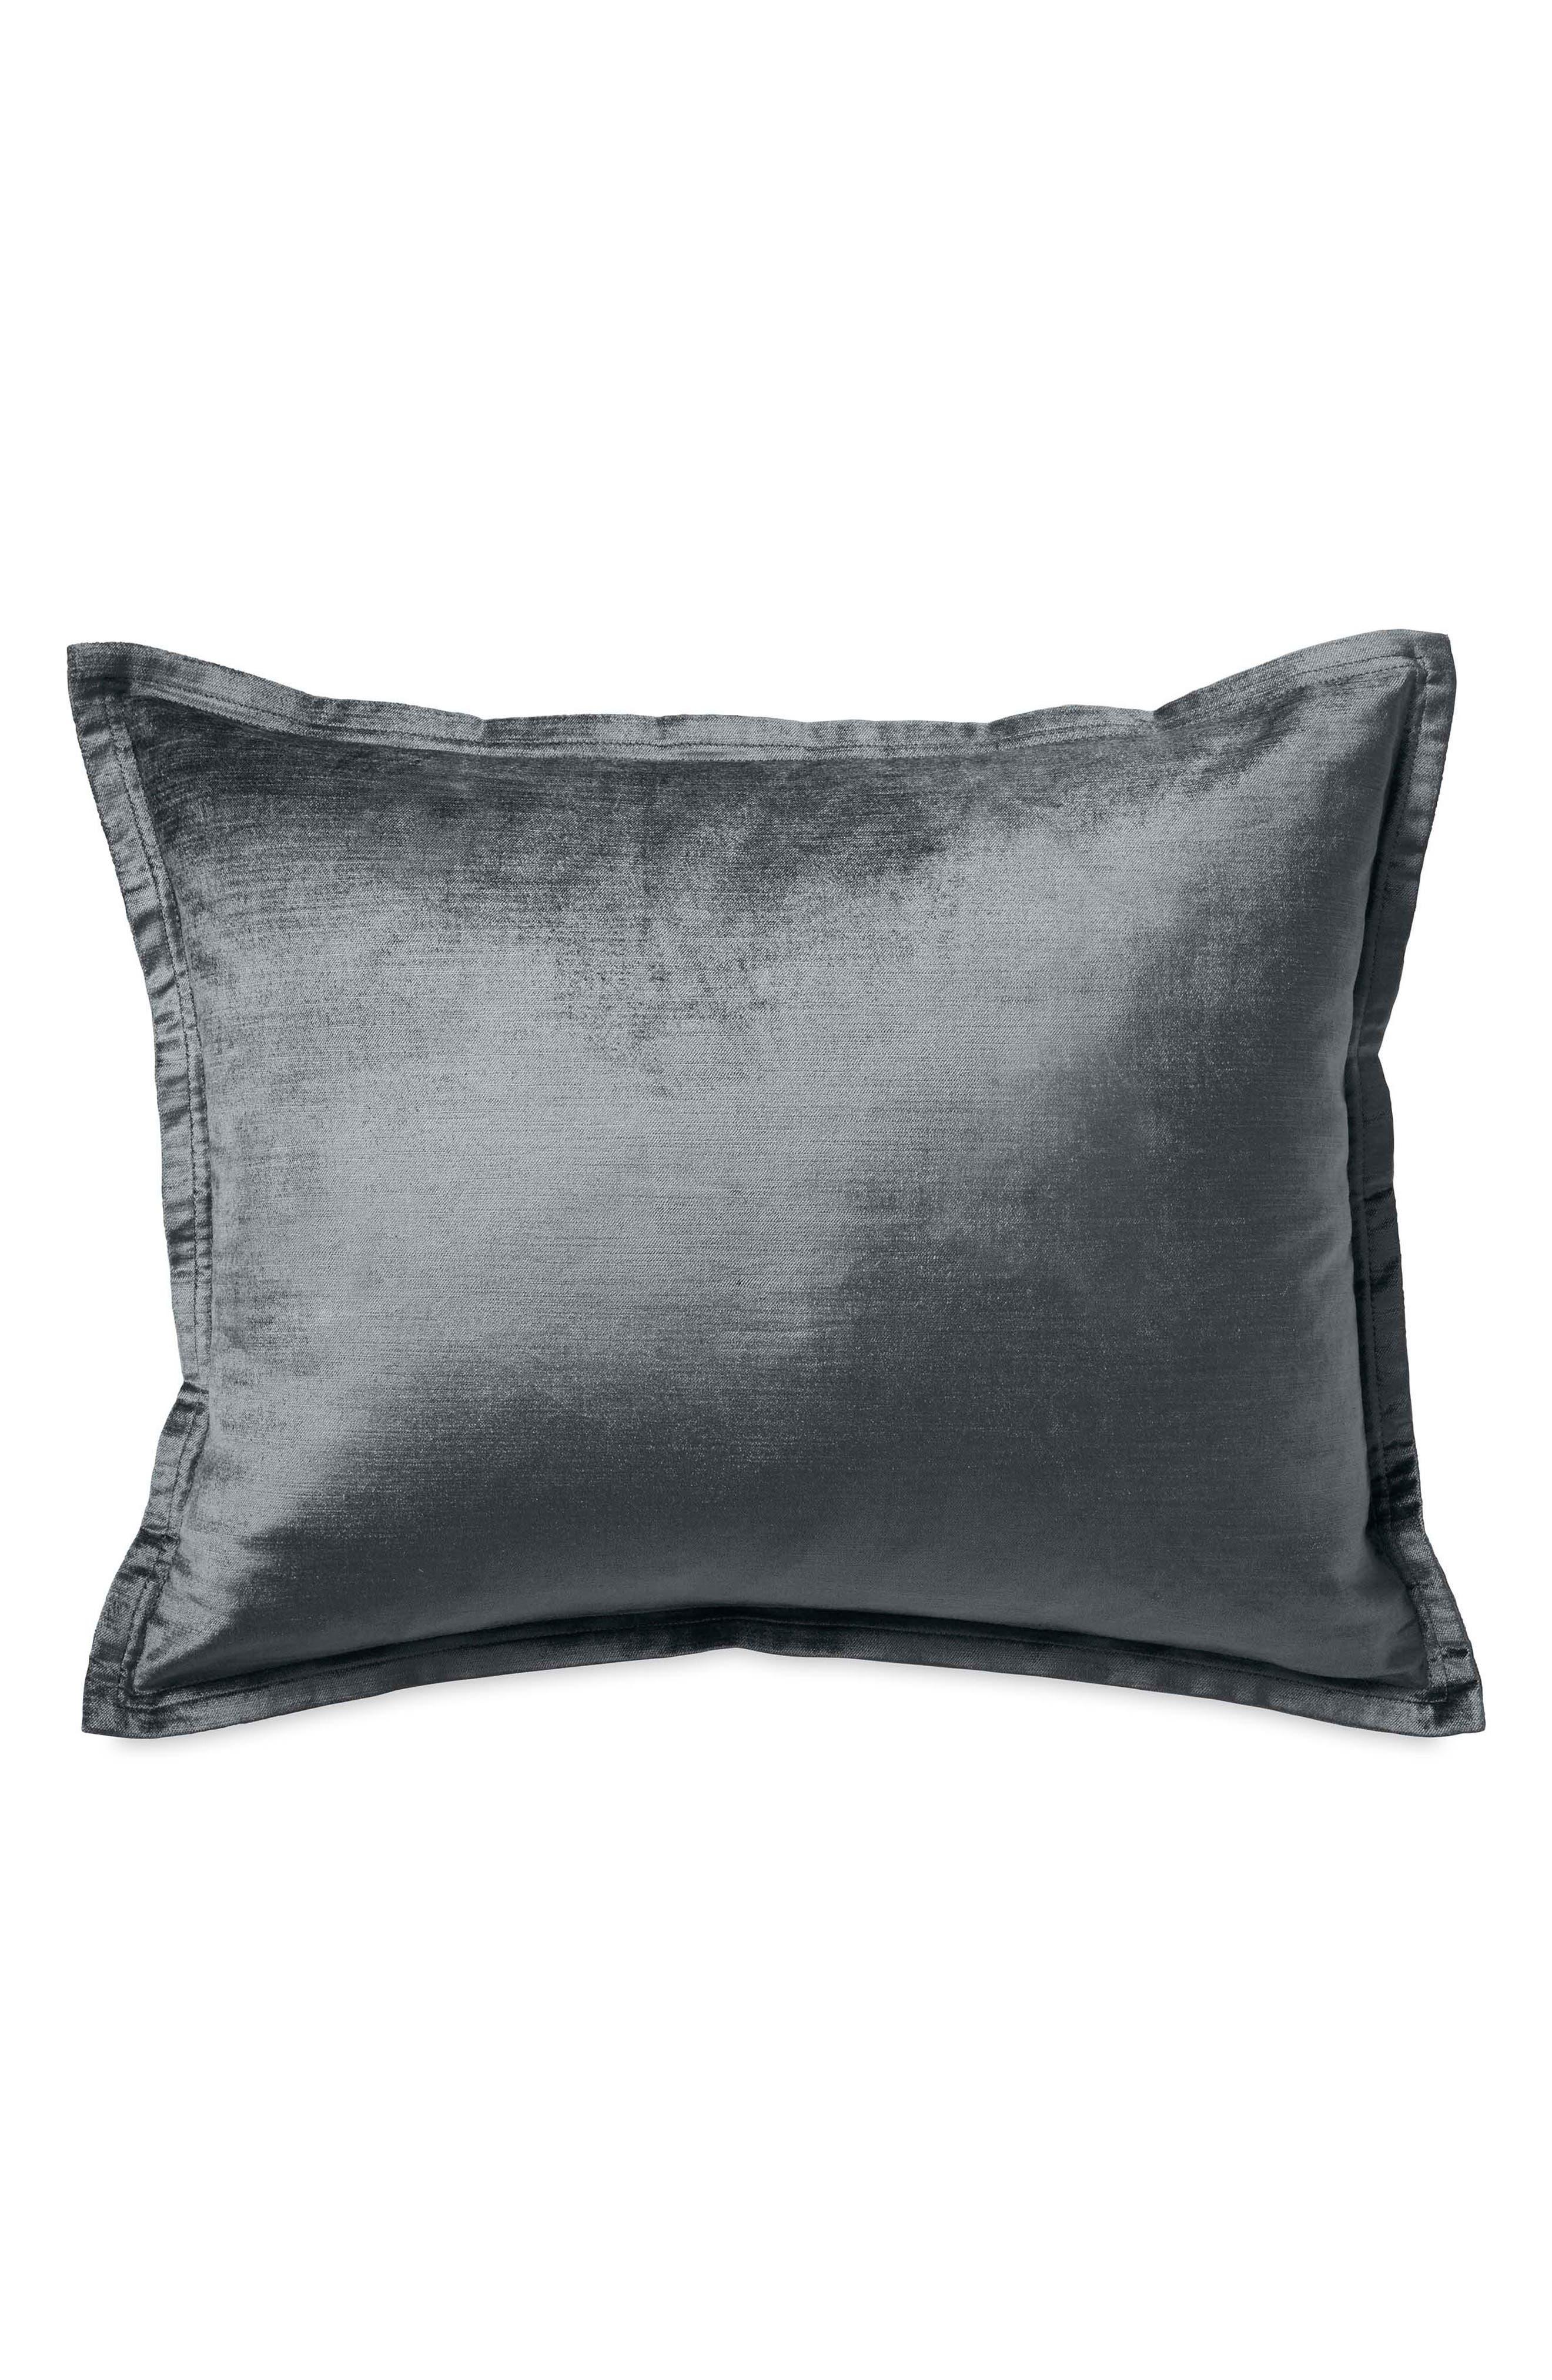 Exhale Pillow,                         Main,                         color, Grey